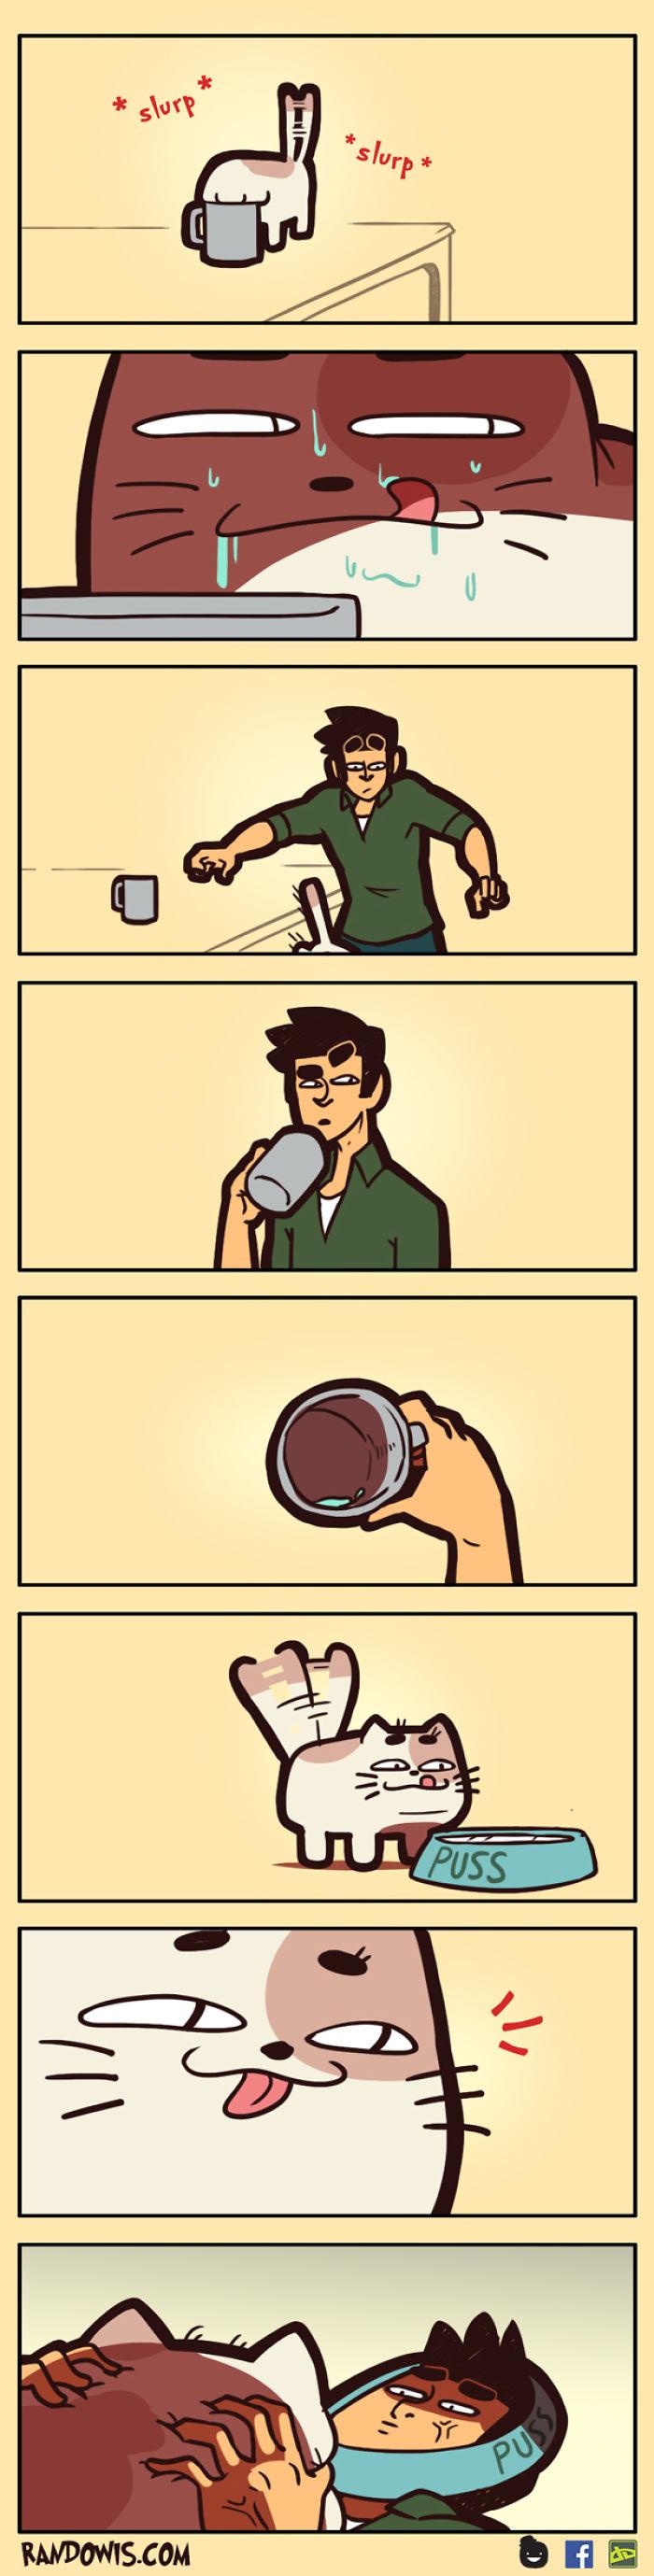 Fun-Weird-Comics-Randowis